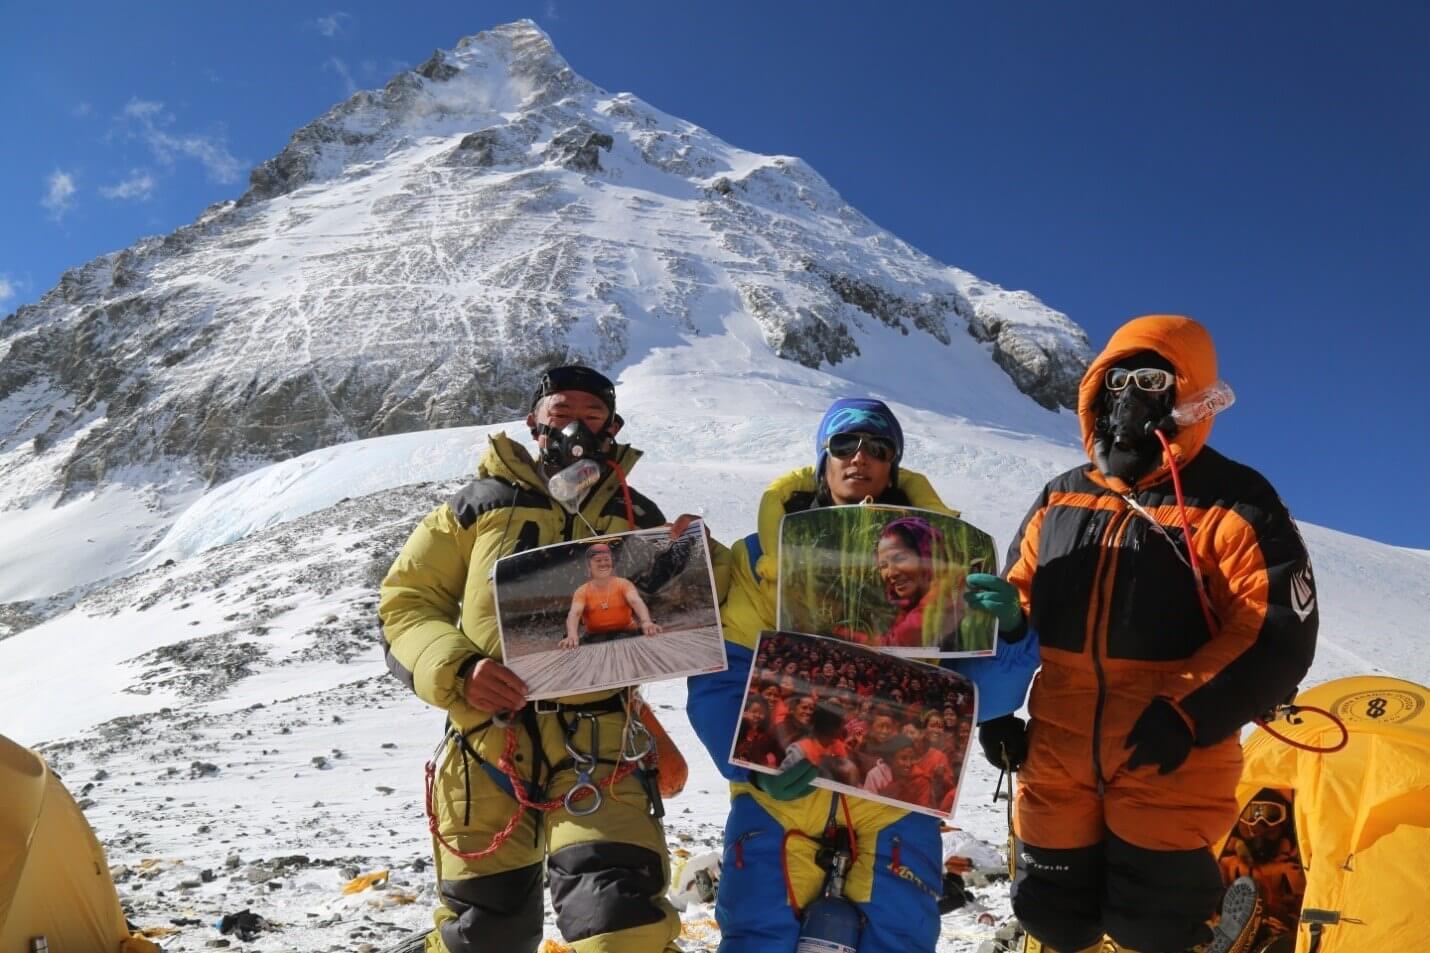 Exposición fotográfica mujeres, Everest, Nepal